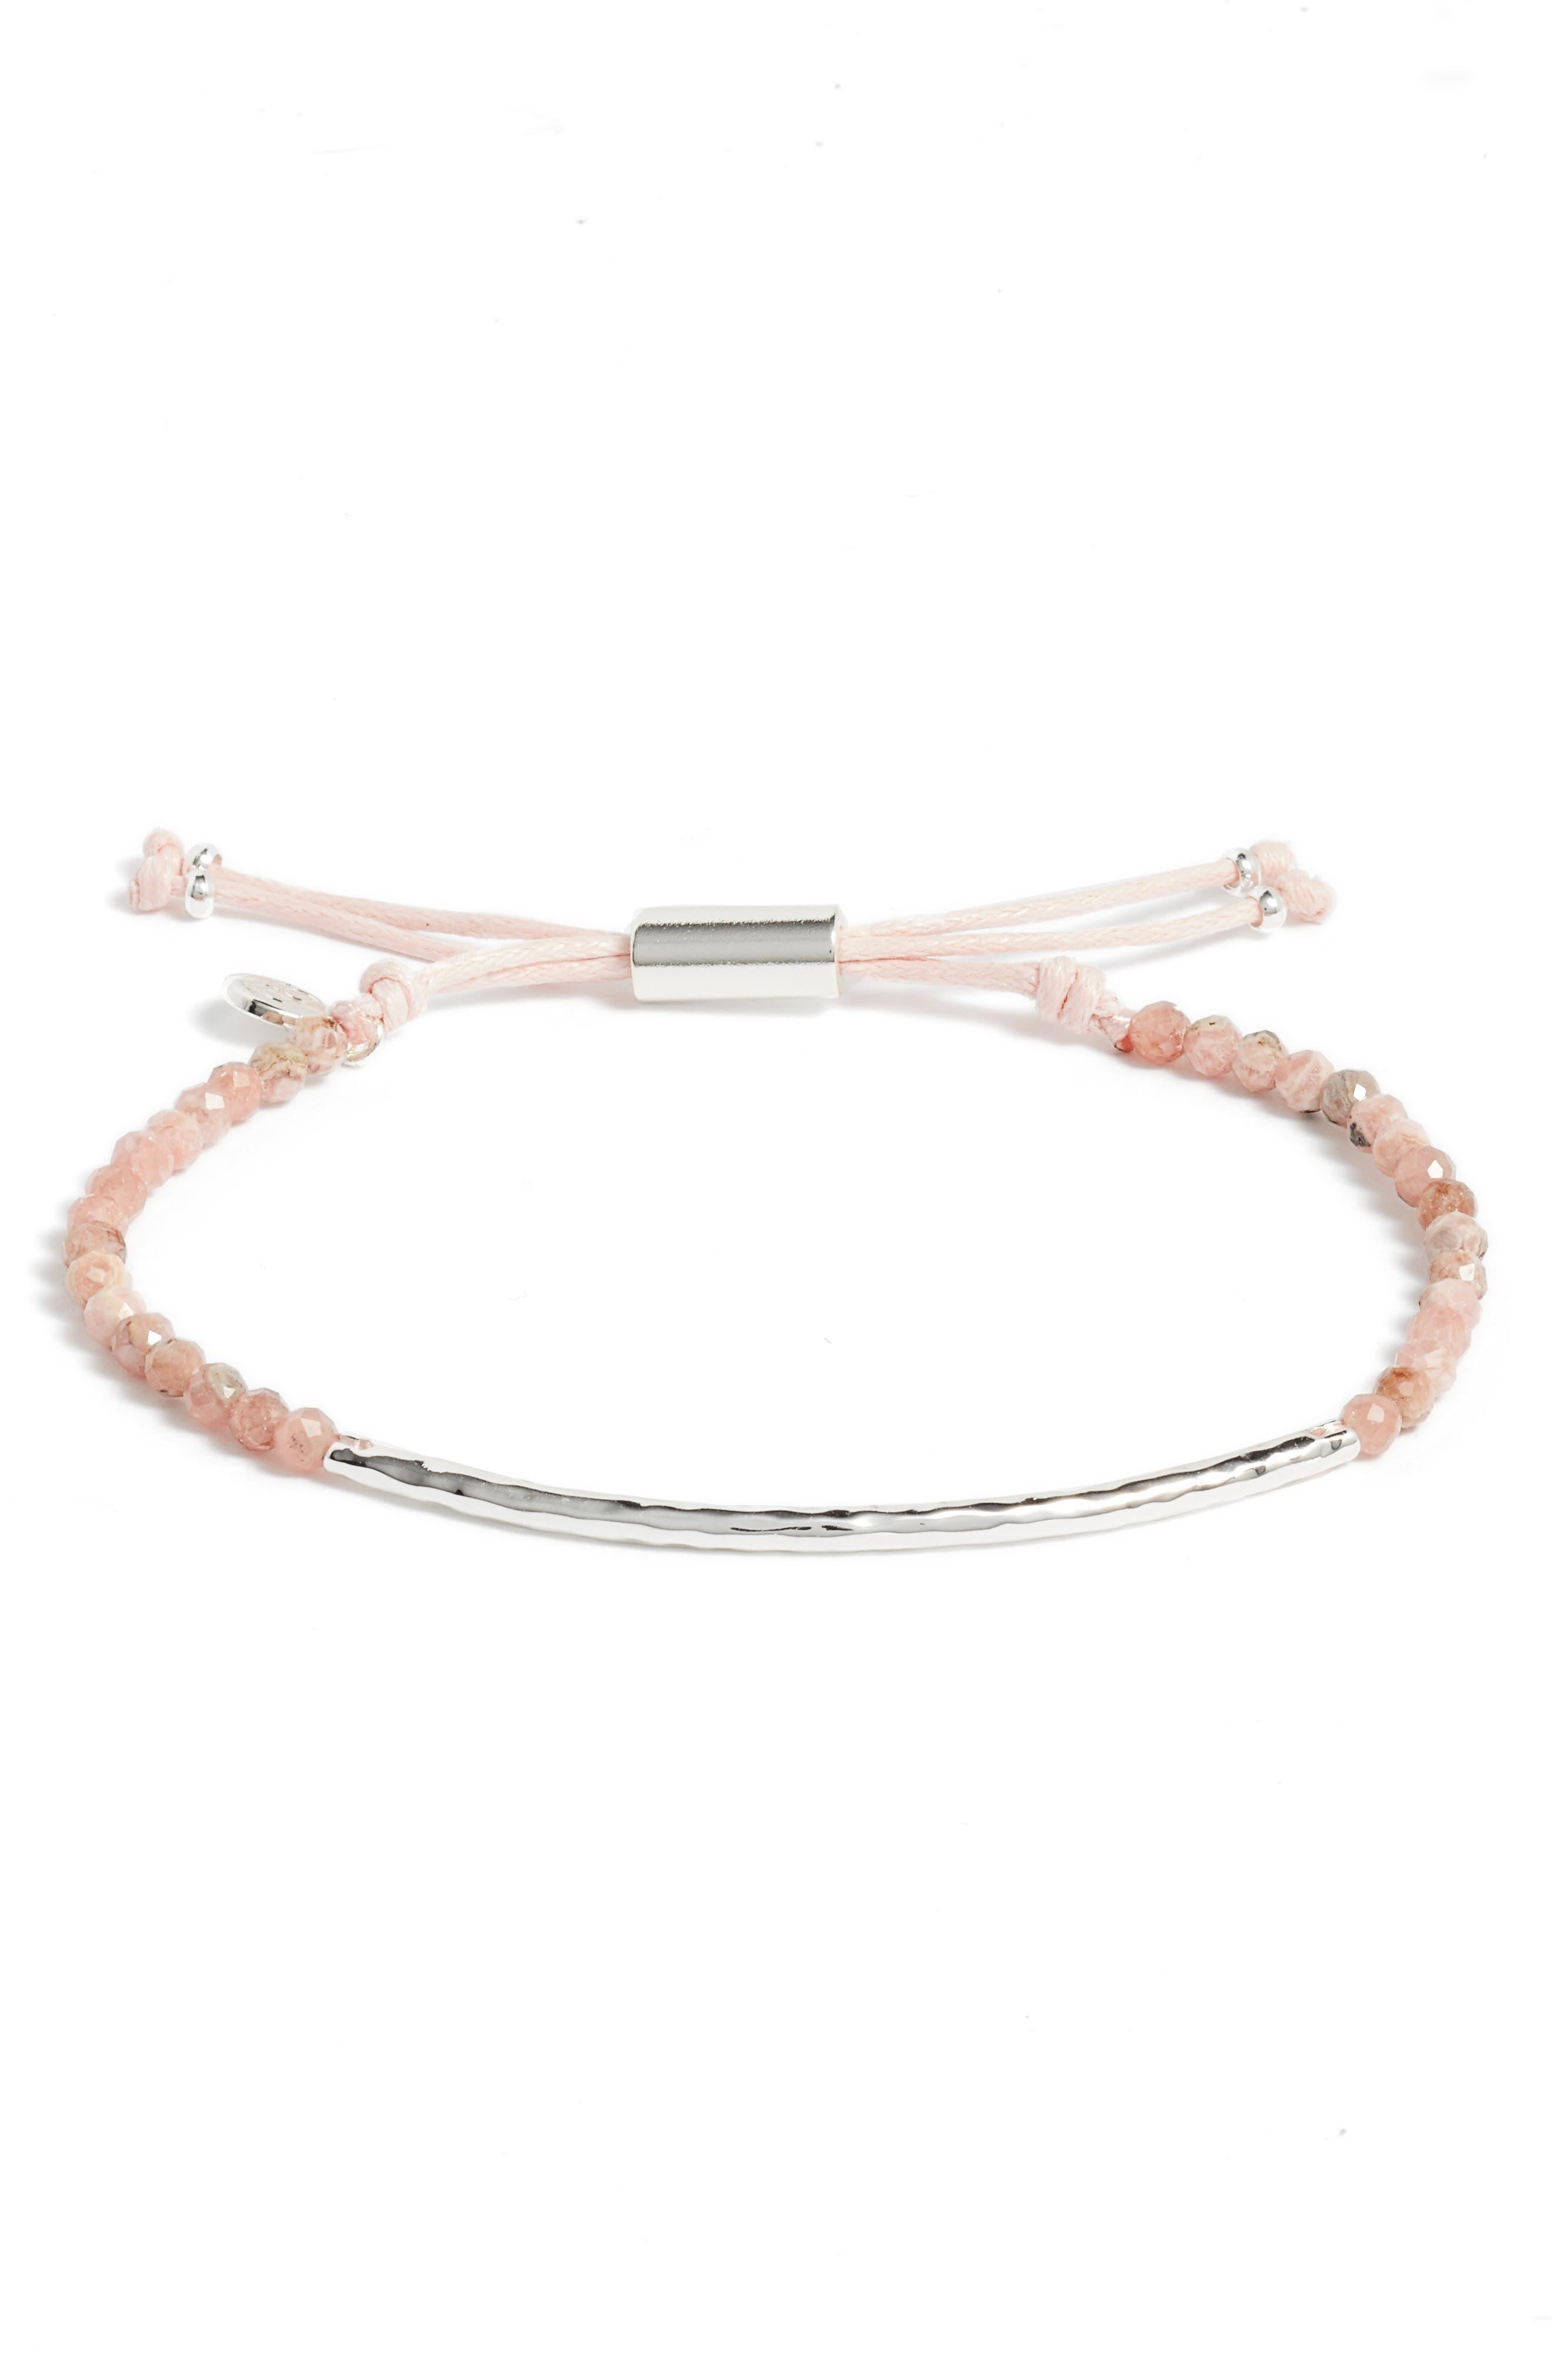 Compassion Gemstone Bracelet,                             Main thumbnail 1, color,                             Rhodocrosite/ Silver